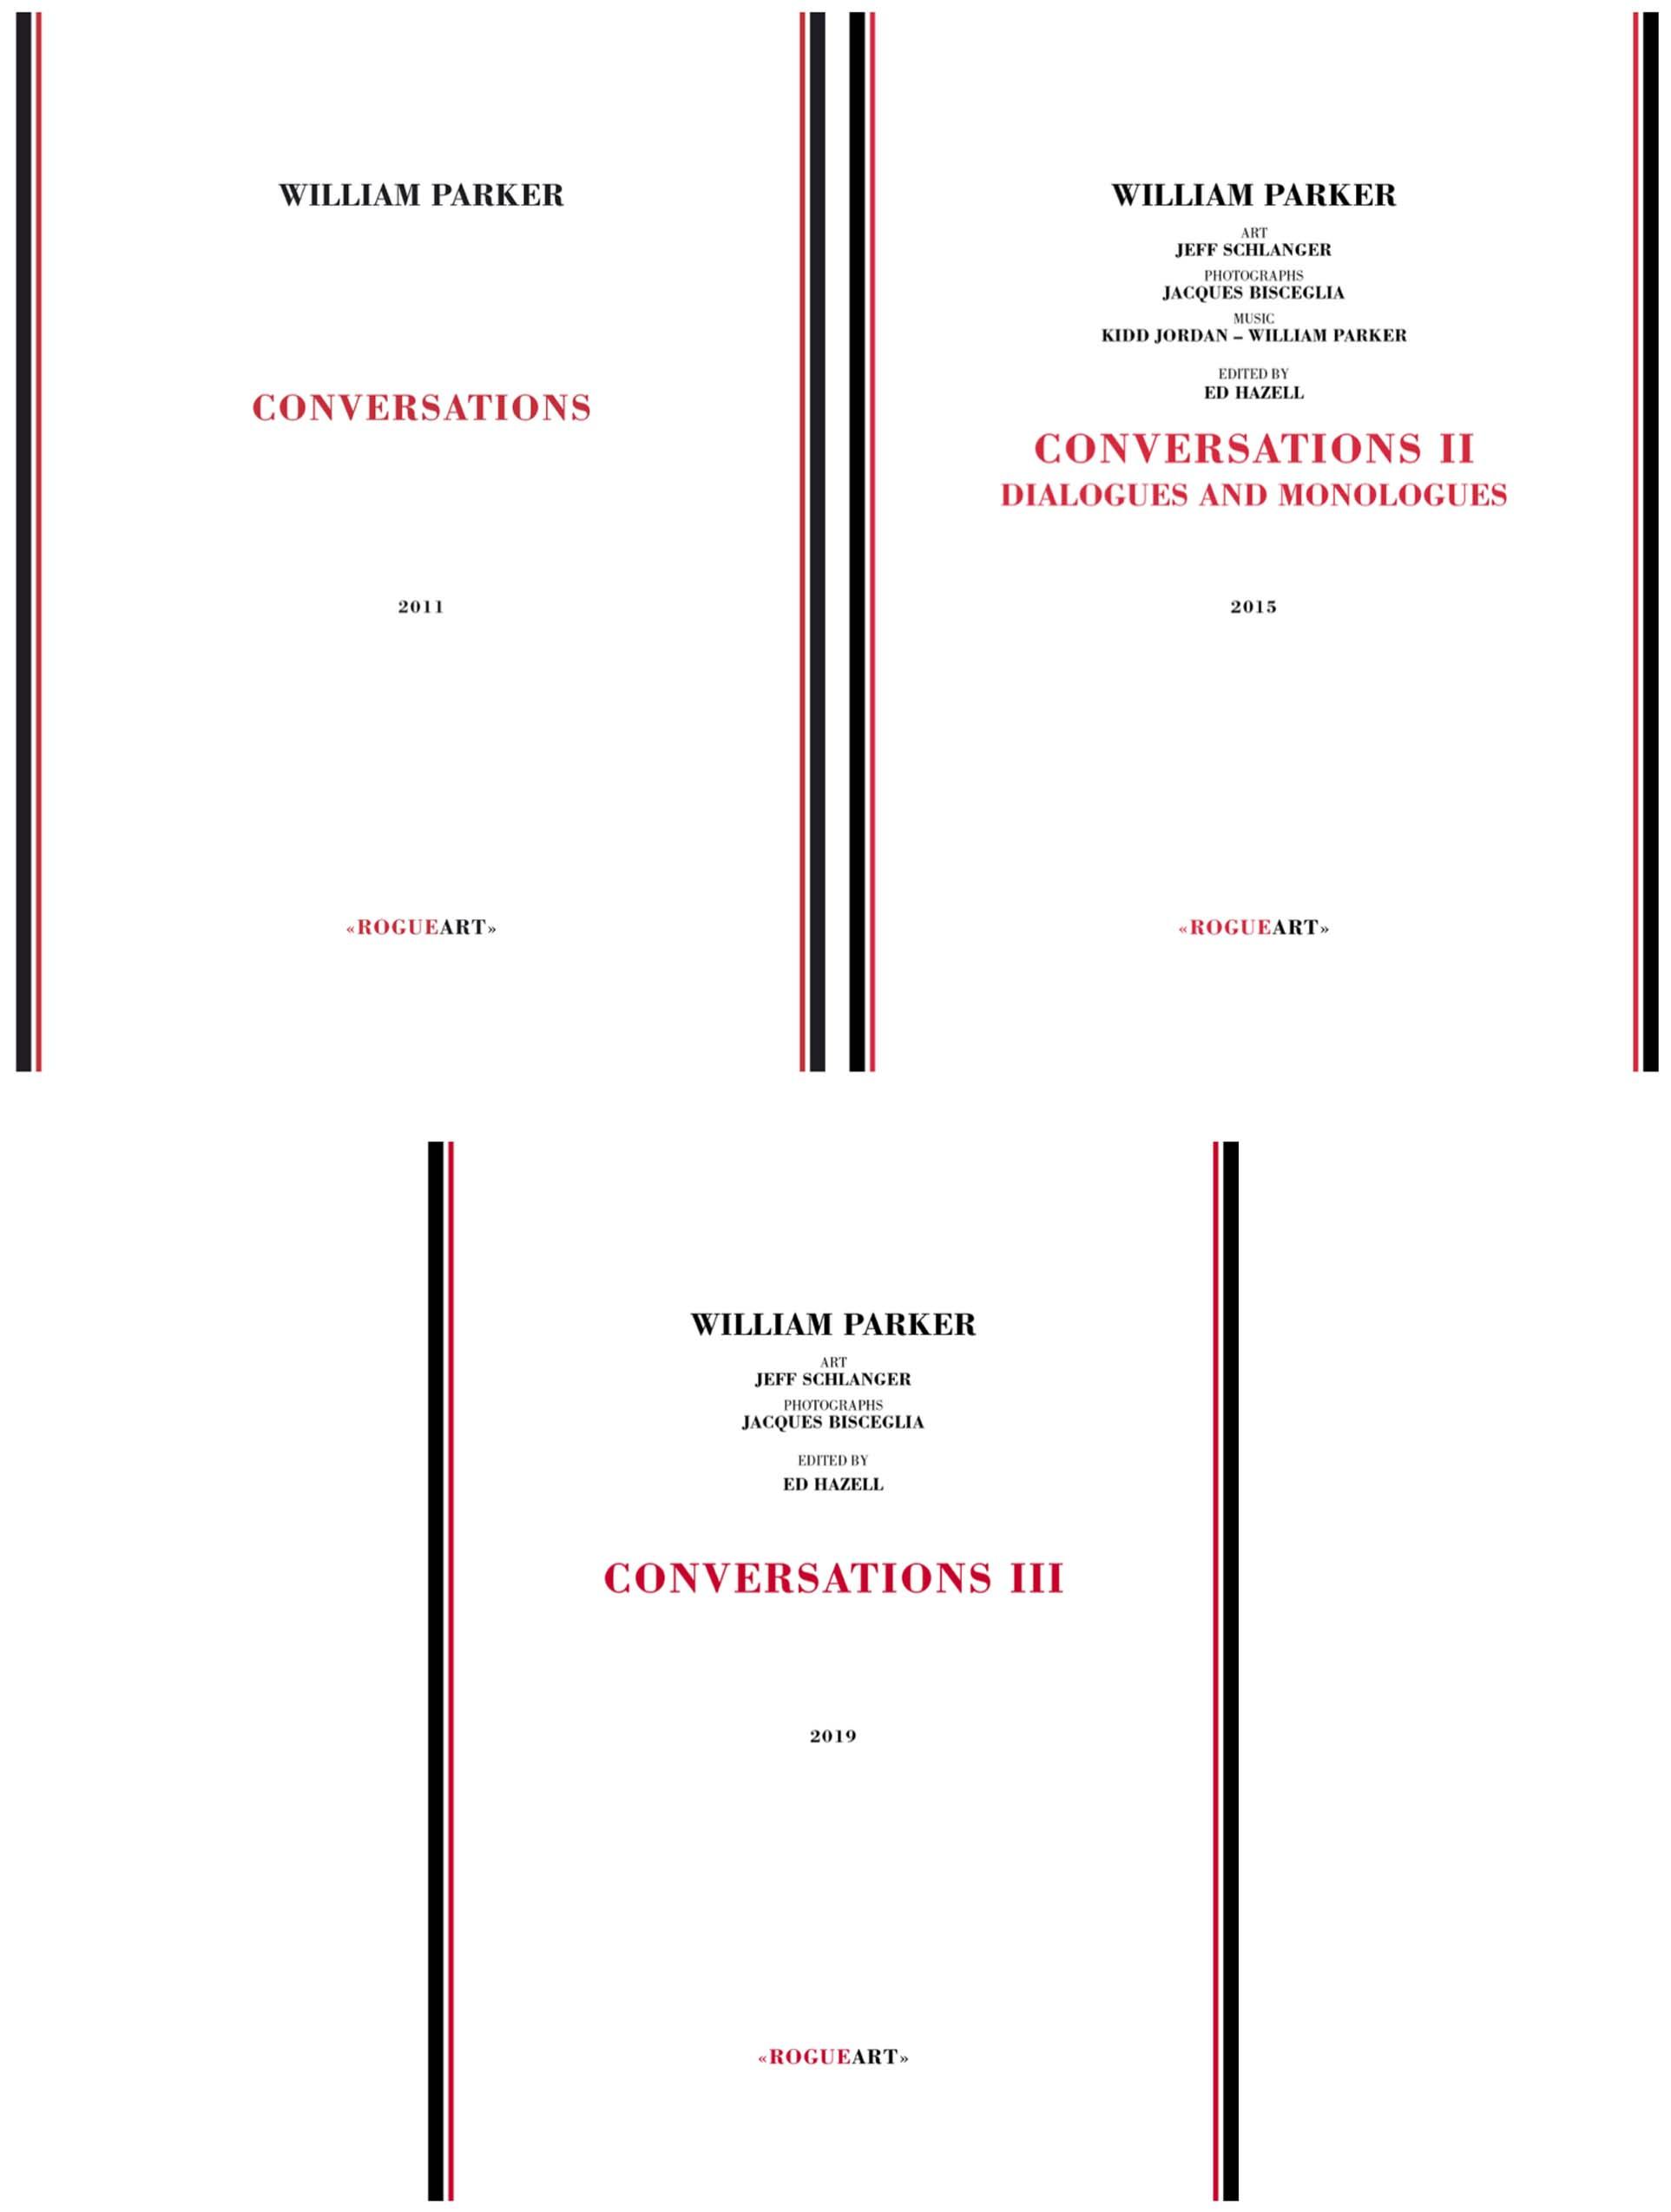 CONVERSATIONS, CONVERSATIONS II, CONVERSATIONS III